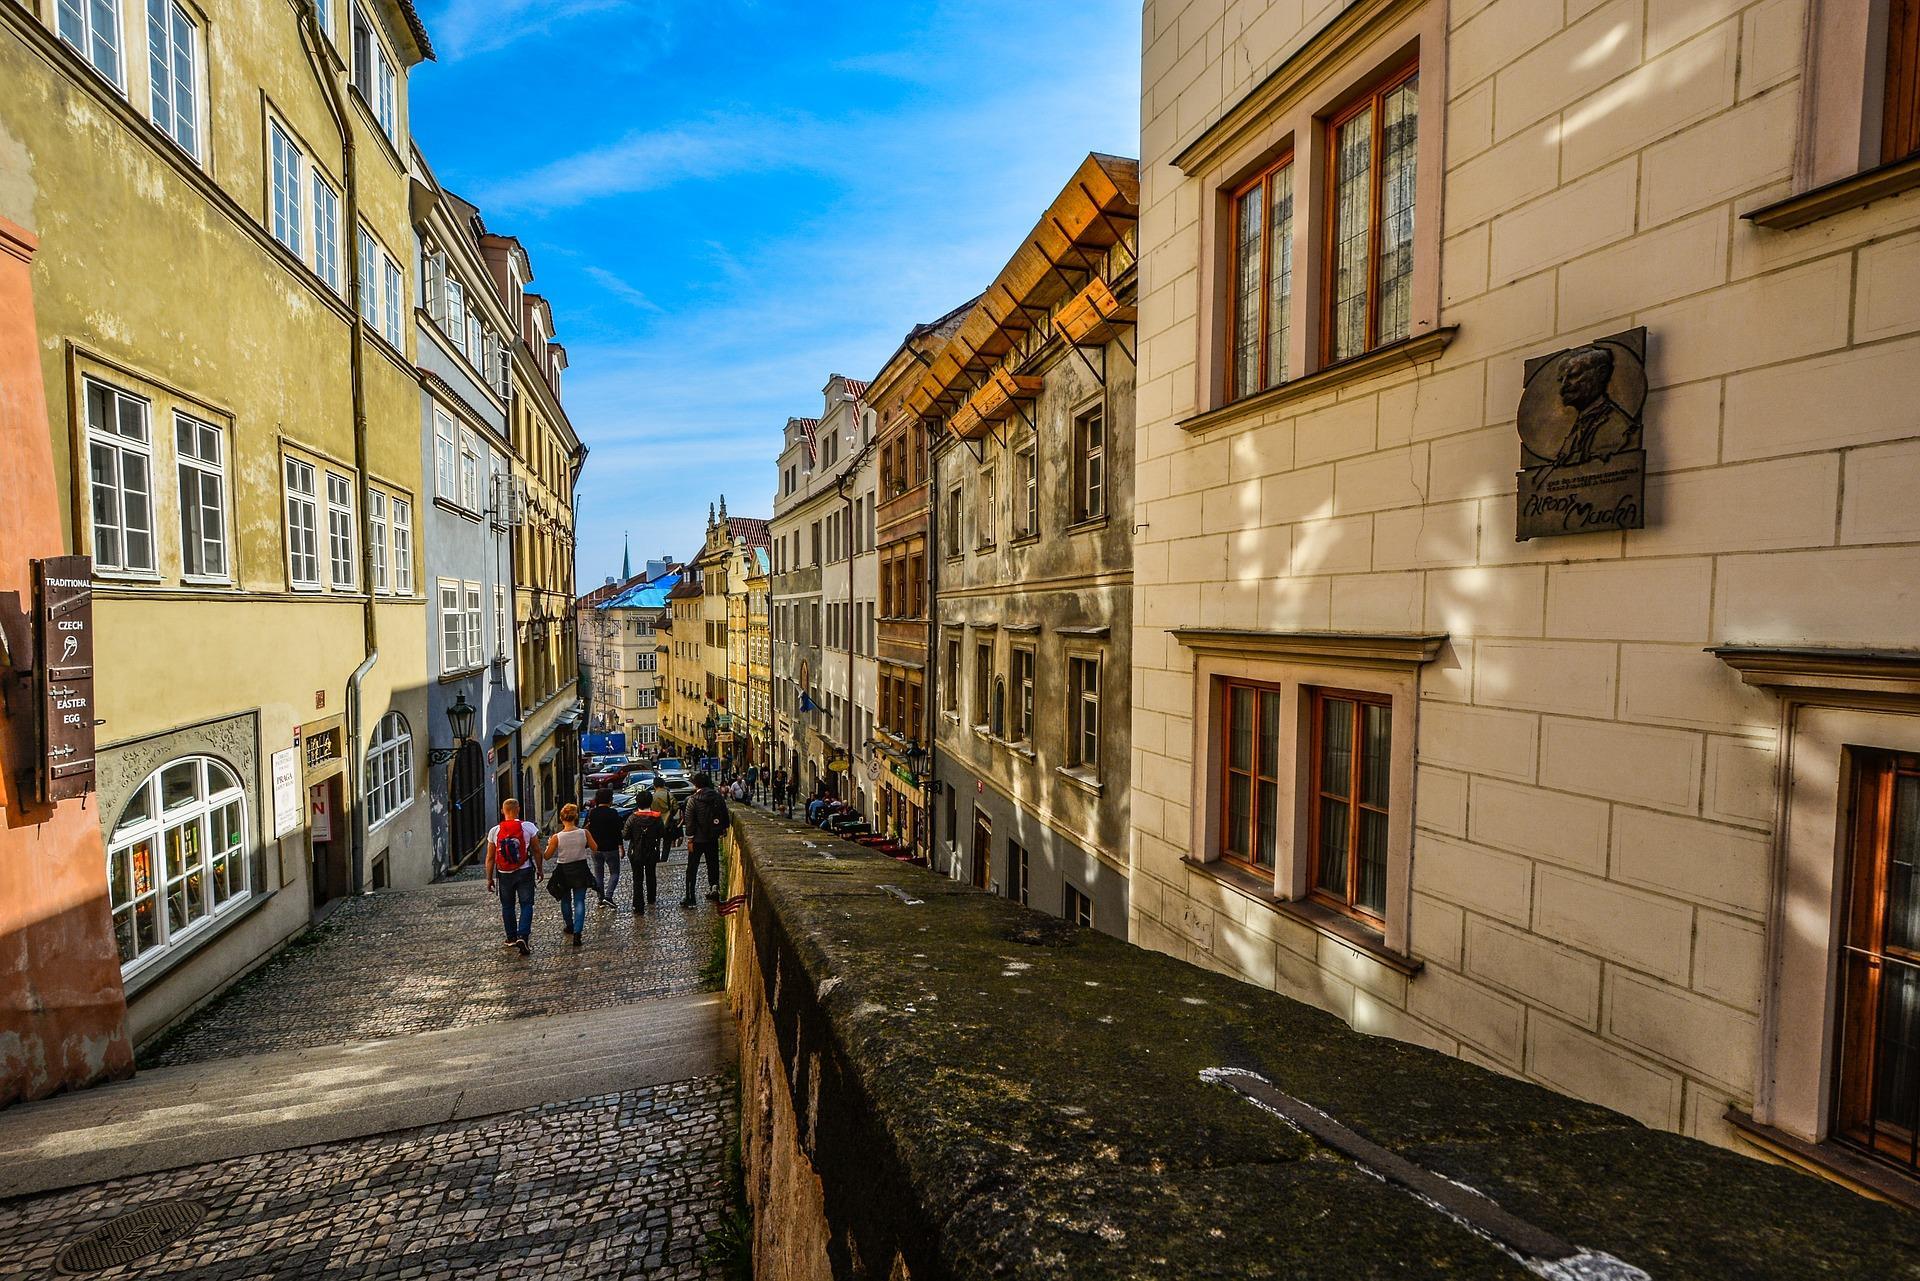 prague-castle-and-mala-strana-district-tour-17